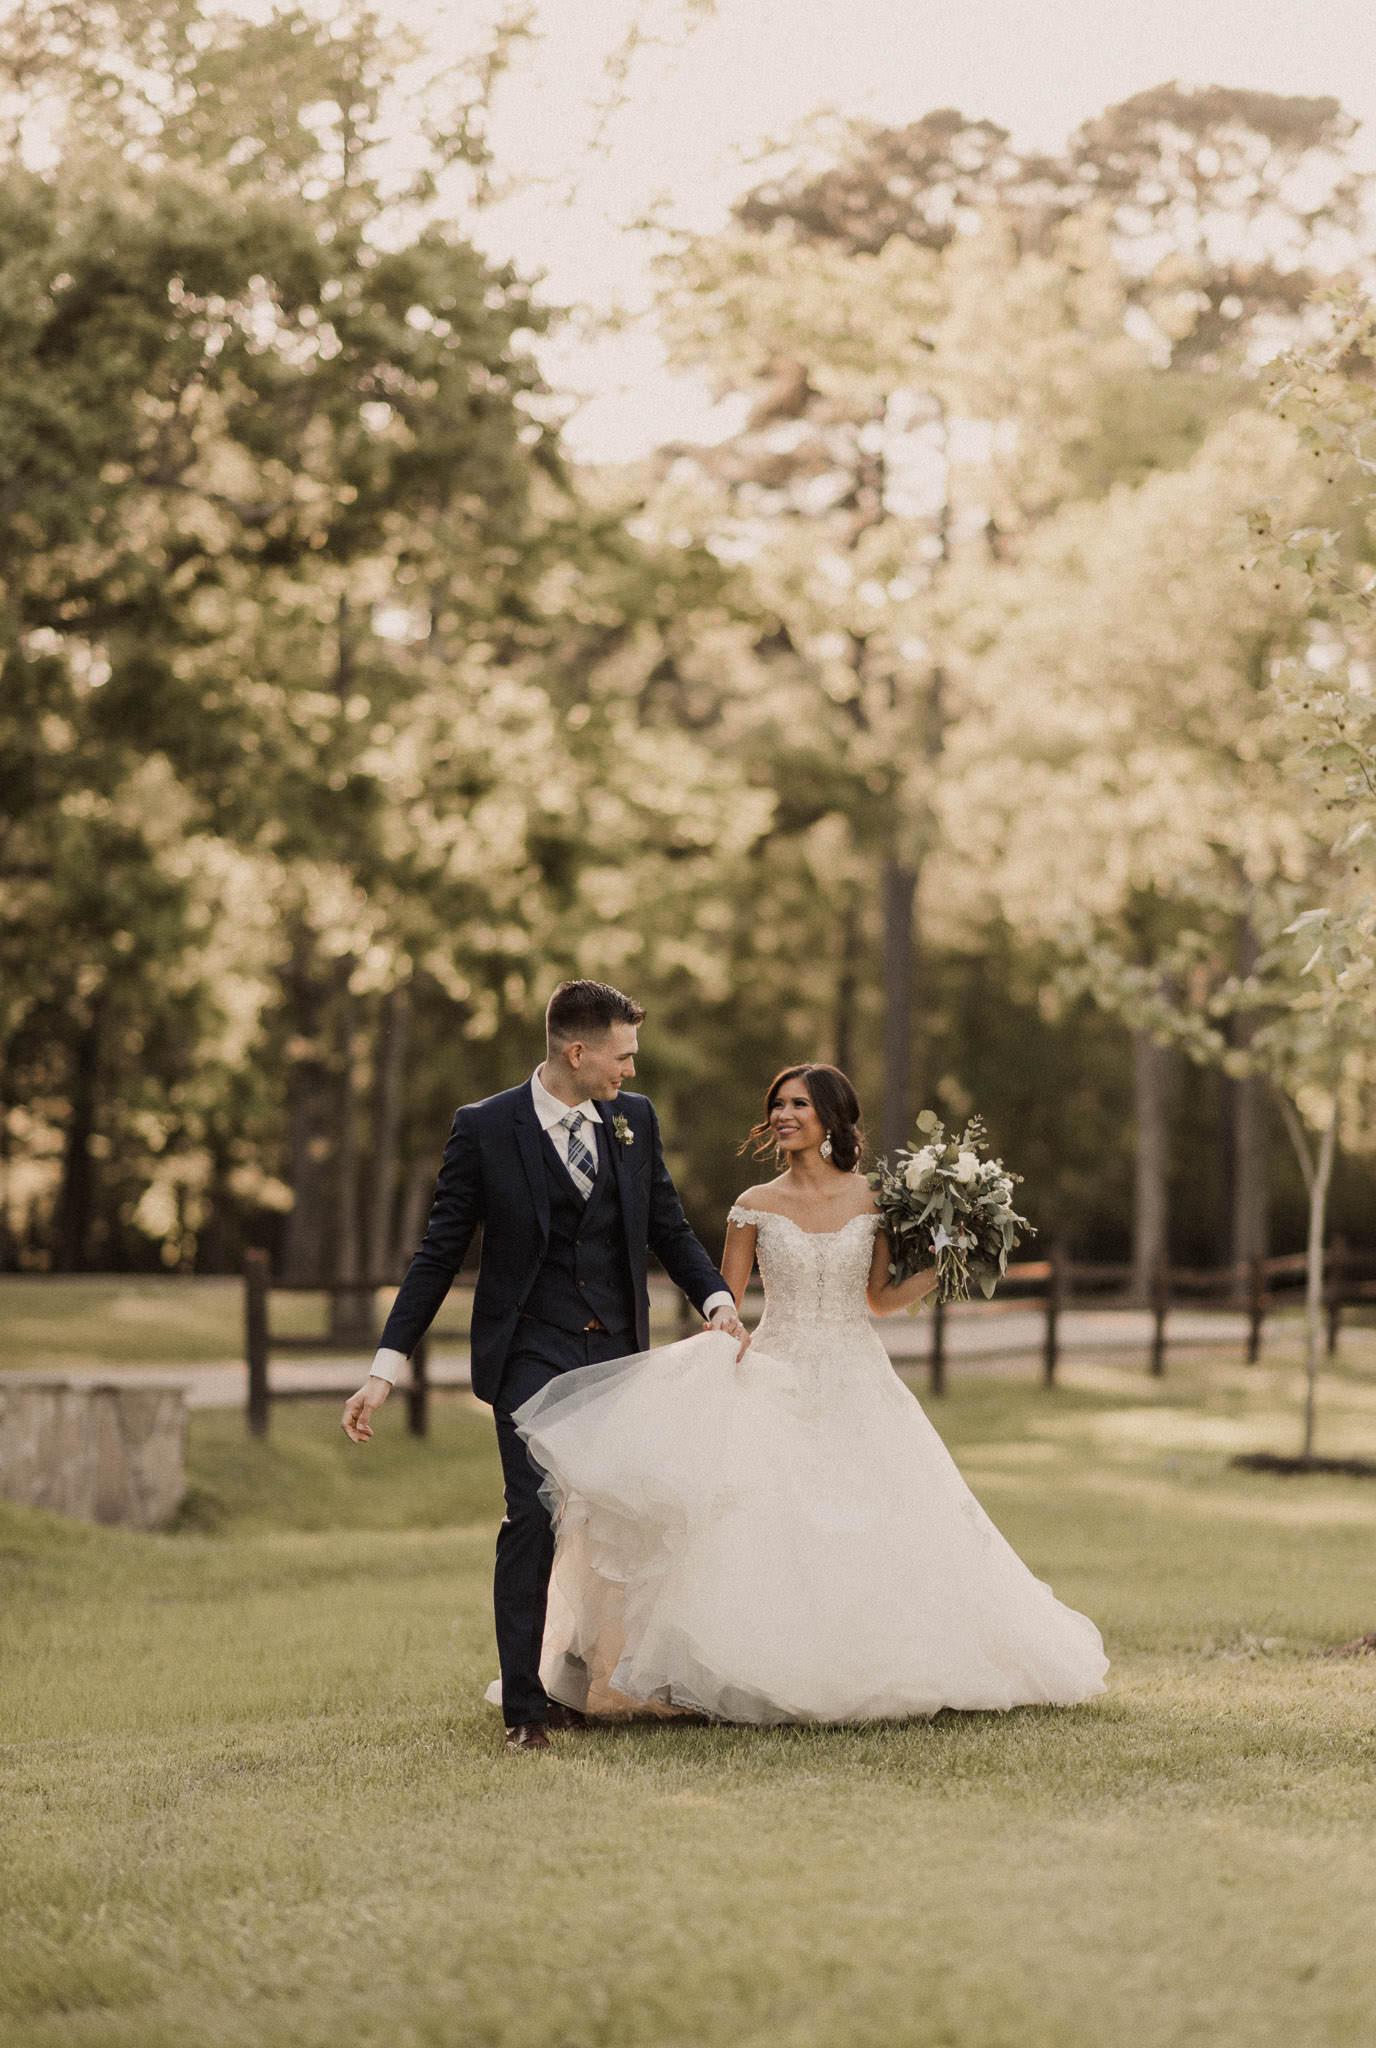 adriana-christian-wedding-re-sm-116.jpg